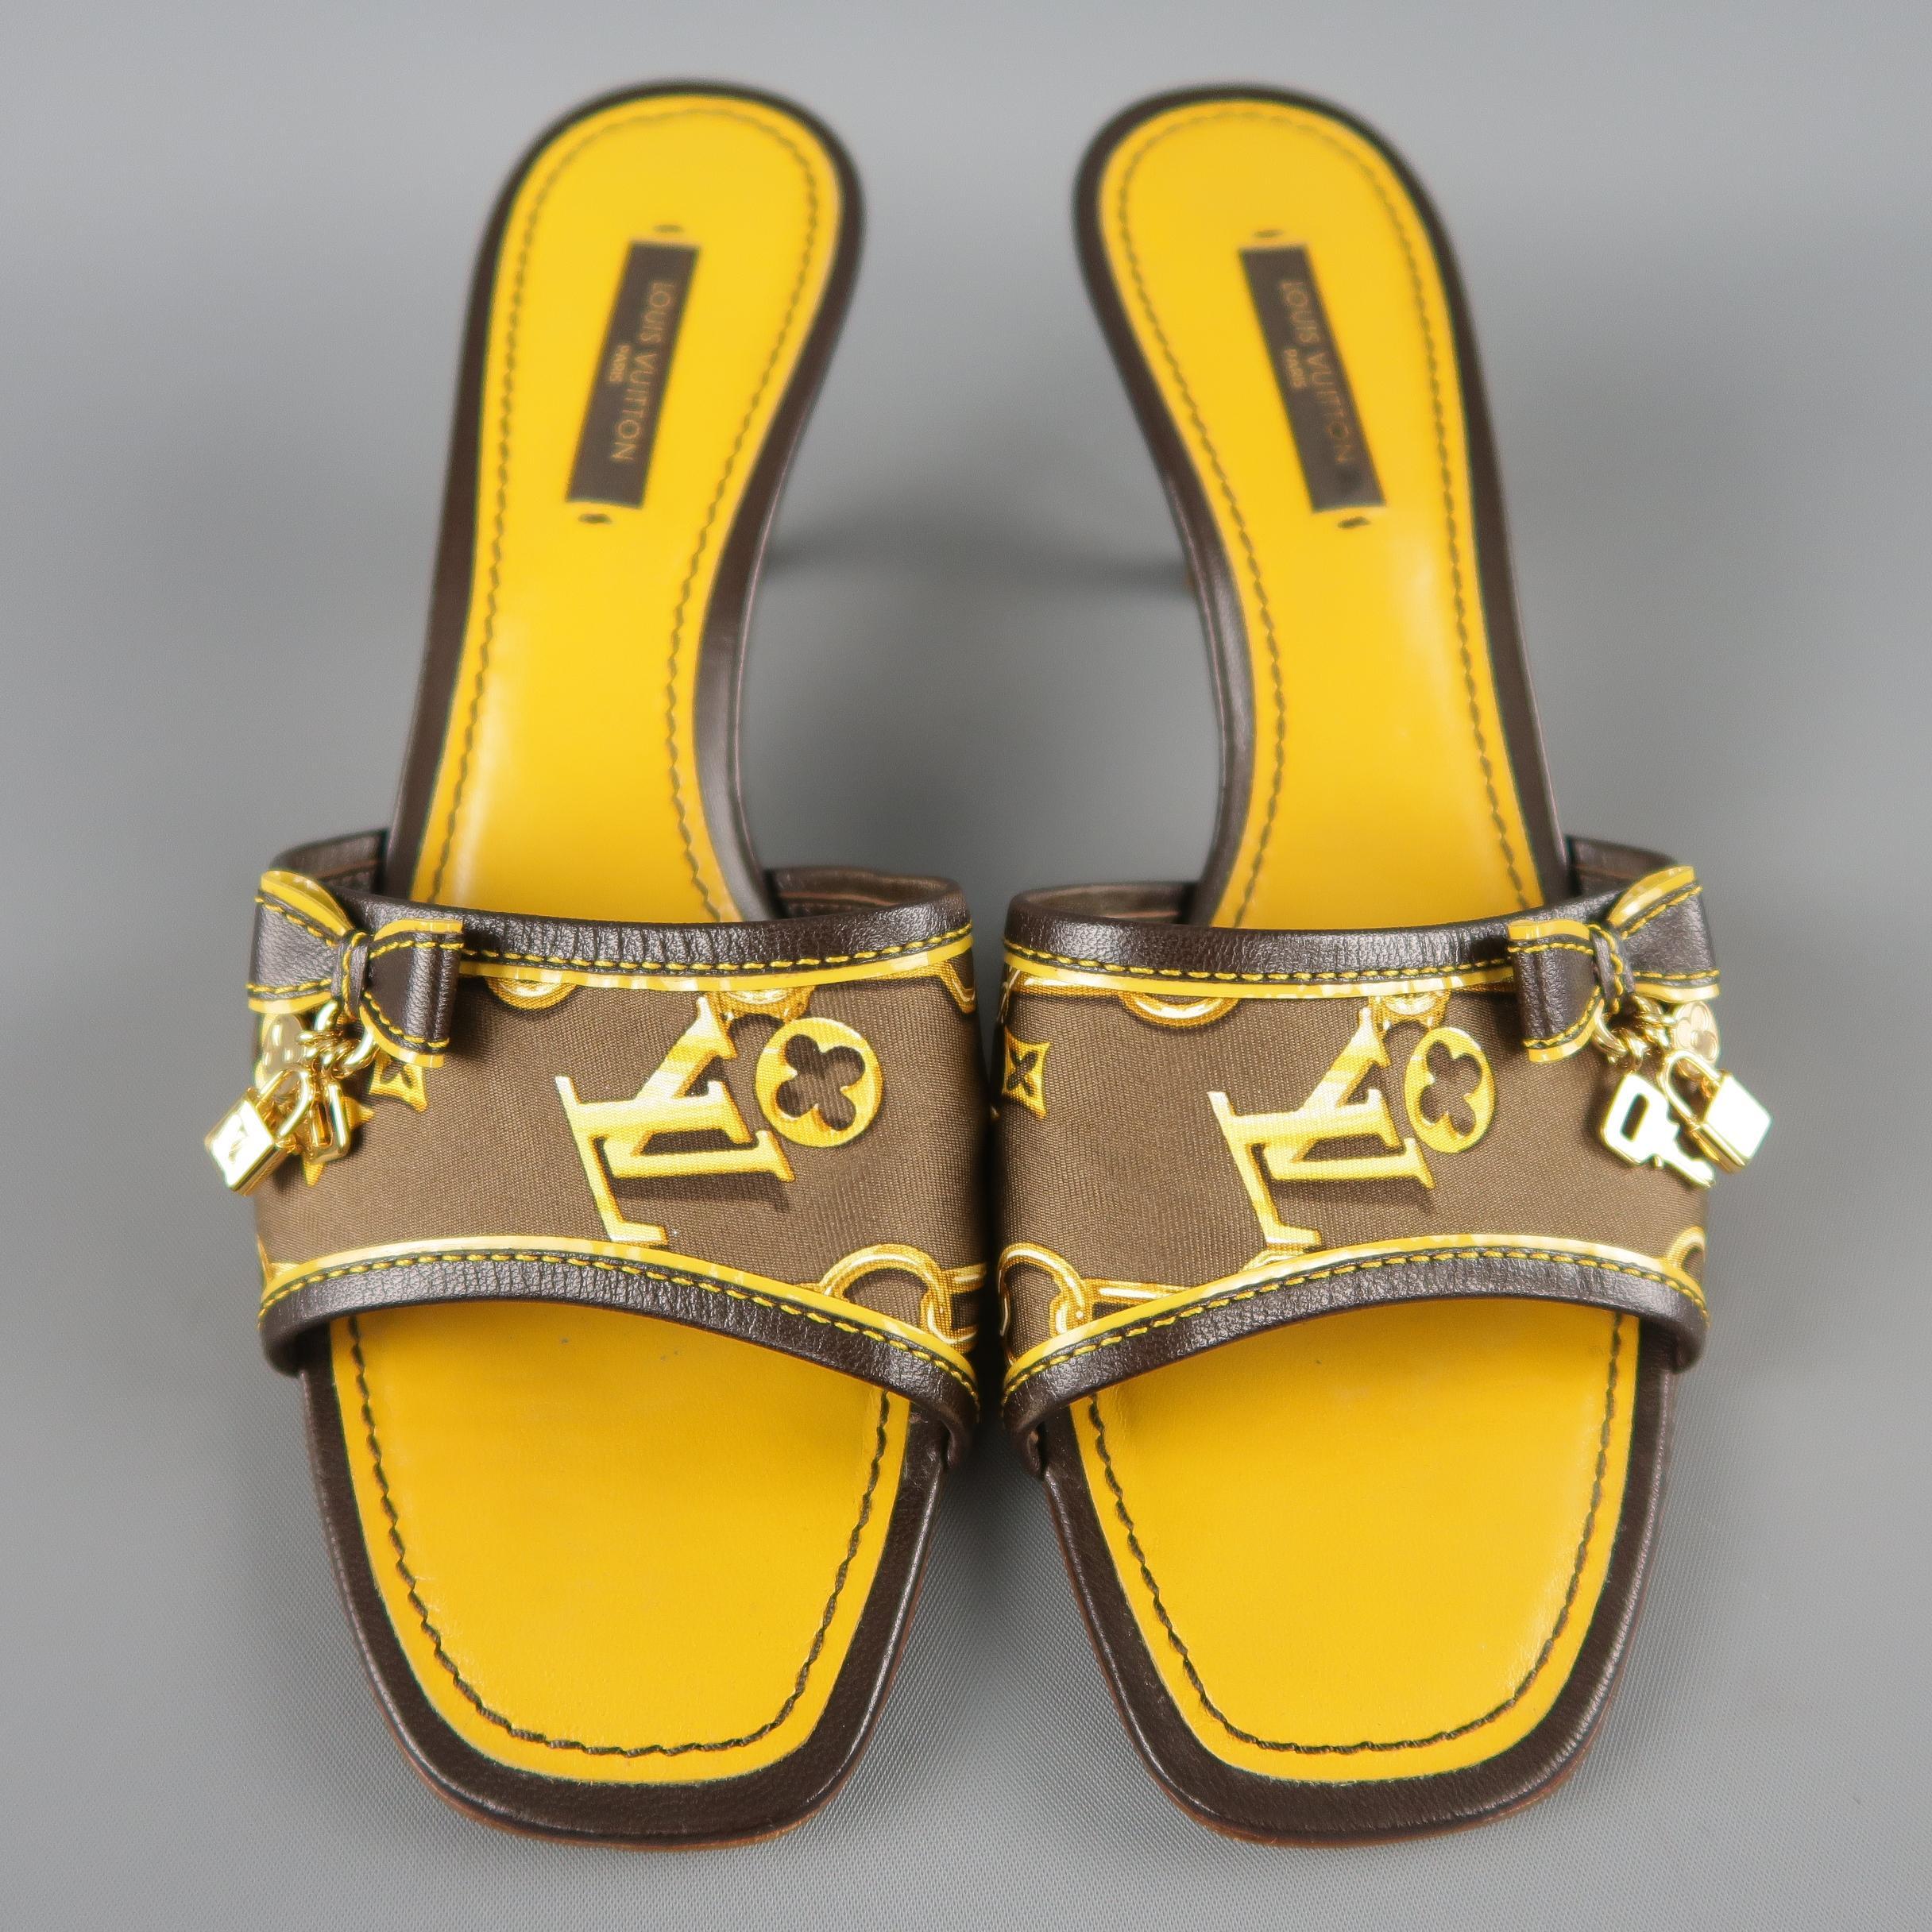 41b72959d00c LOUIS VUITTON Size 7.5 Brown Silk Charms Cabas Kitten Heel Mules at 1stdibs